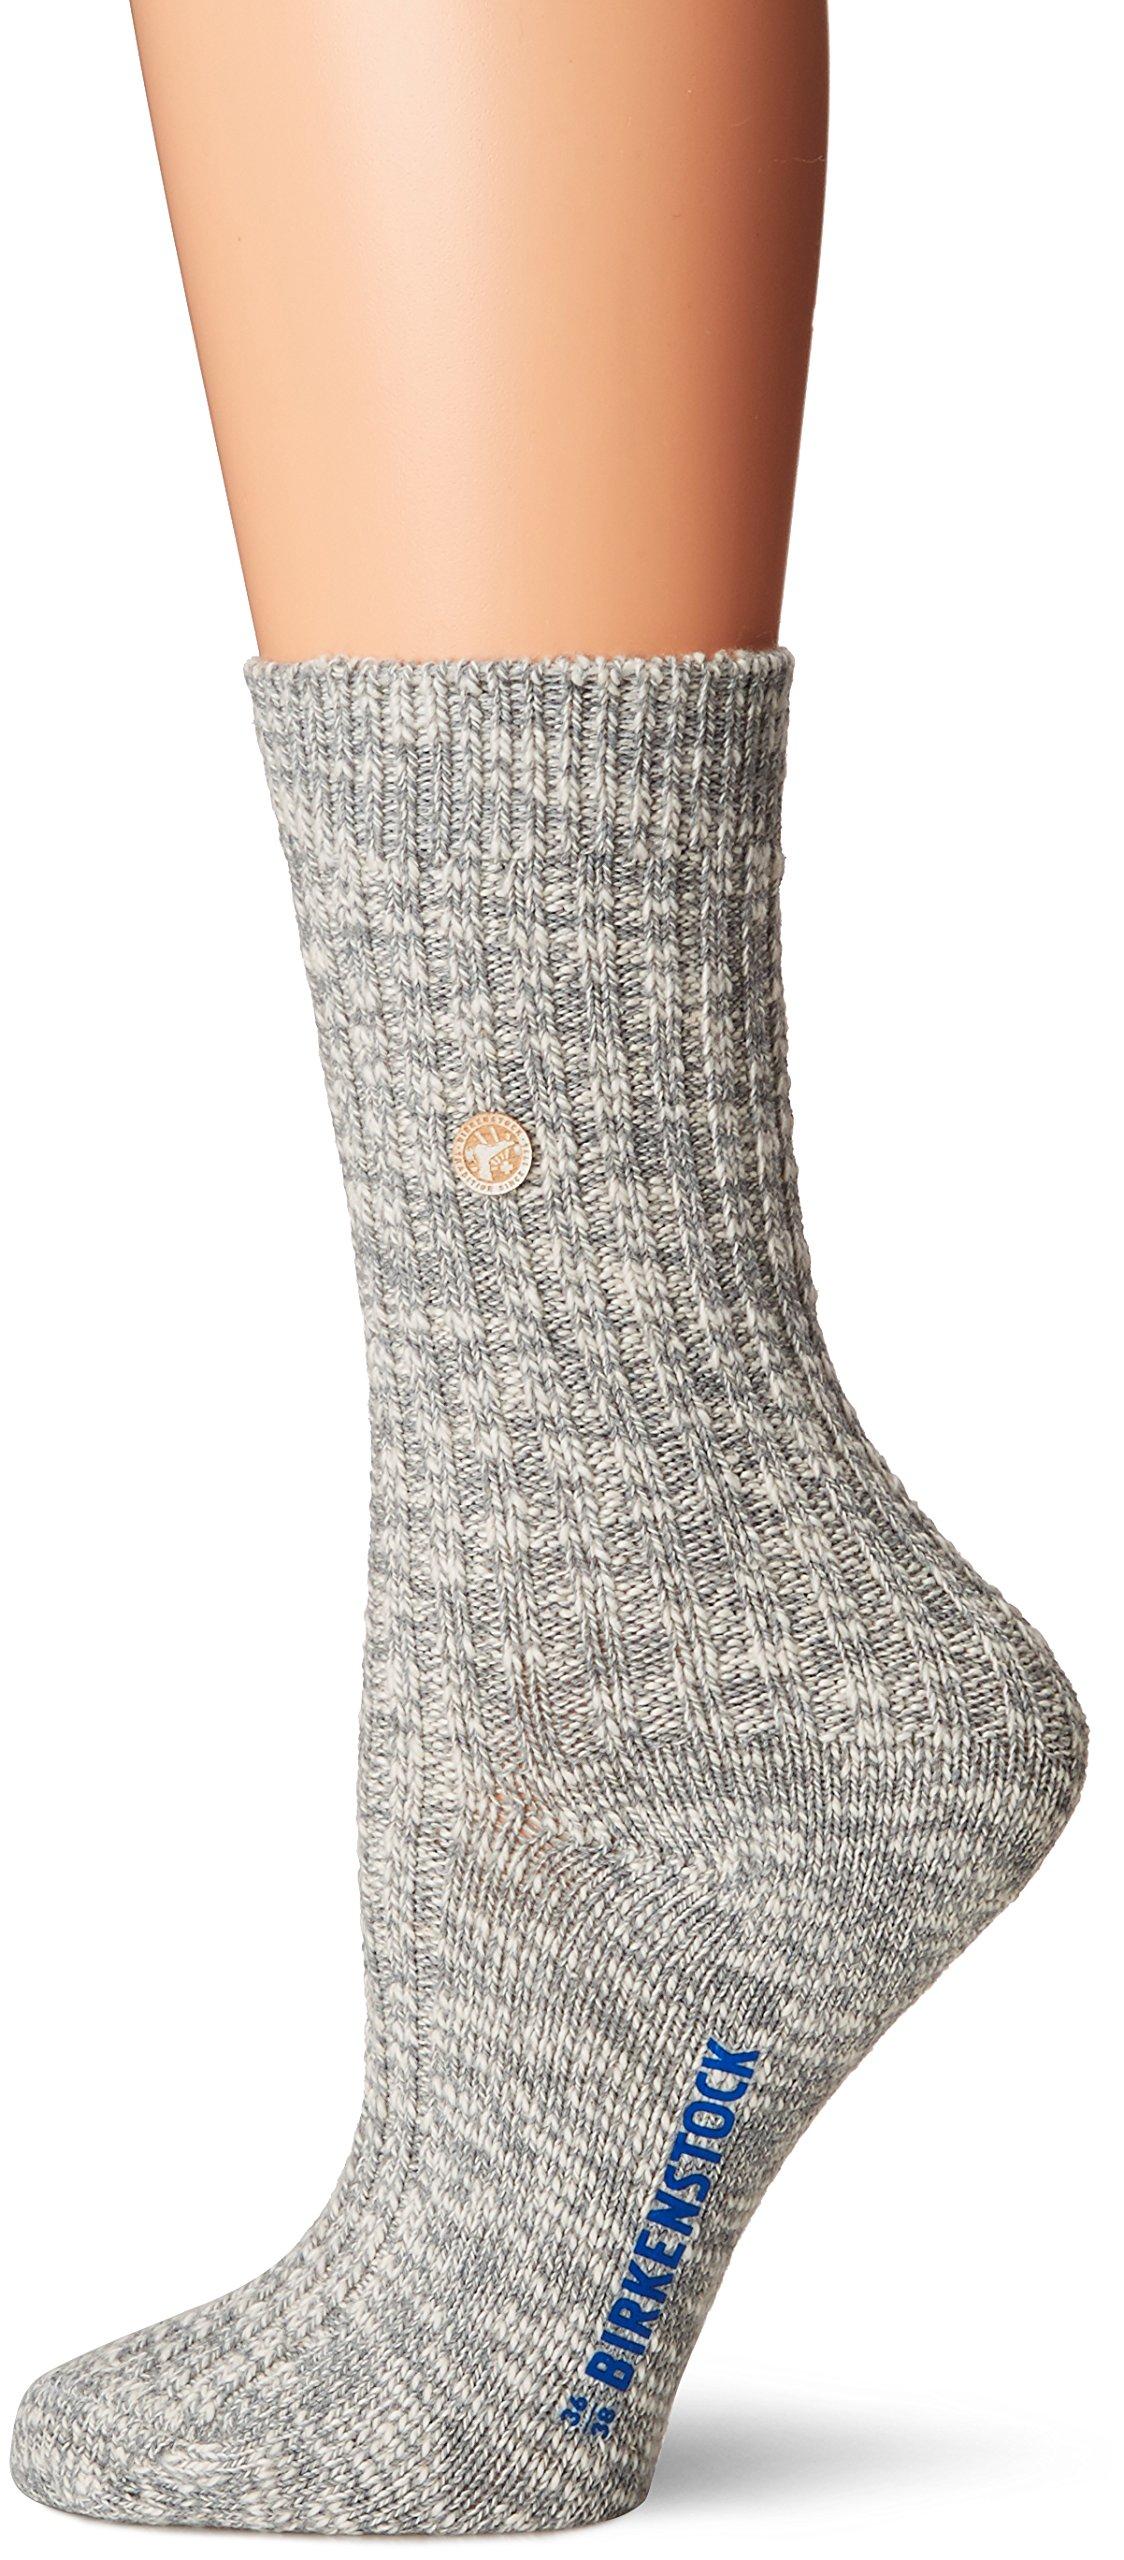 Birkenstock Womens Cotton Slub Grey/White Sock - 36-38